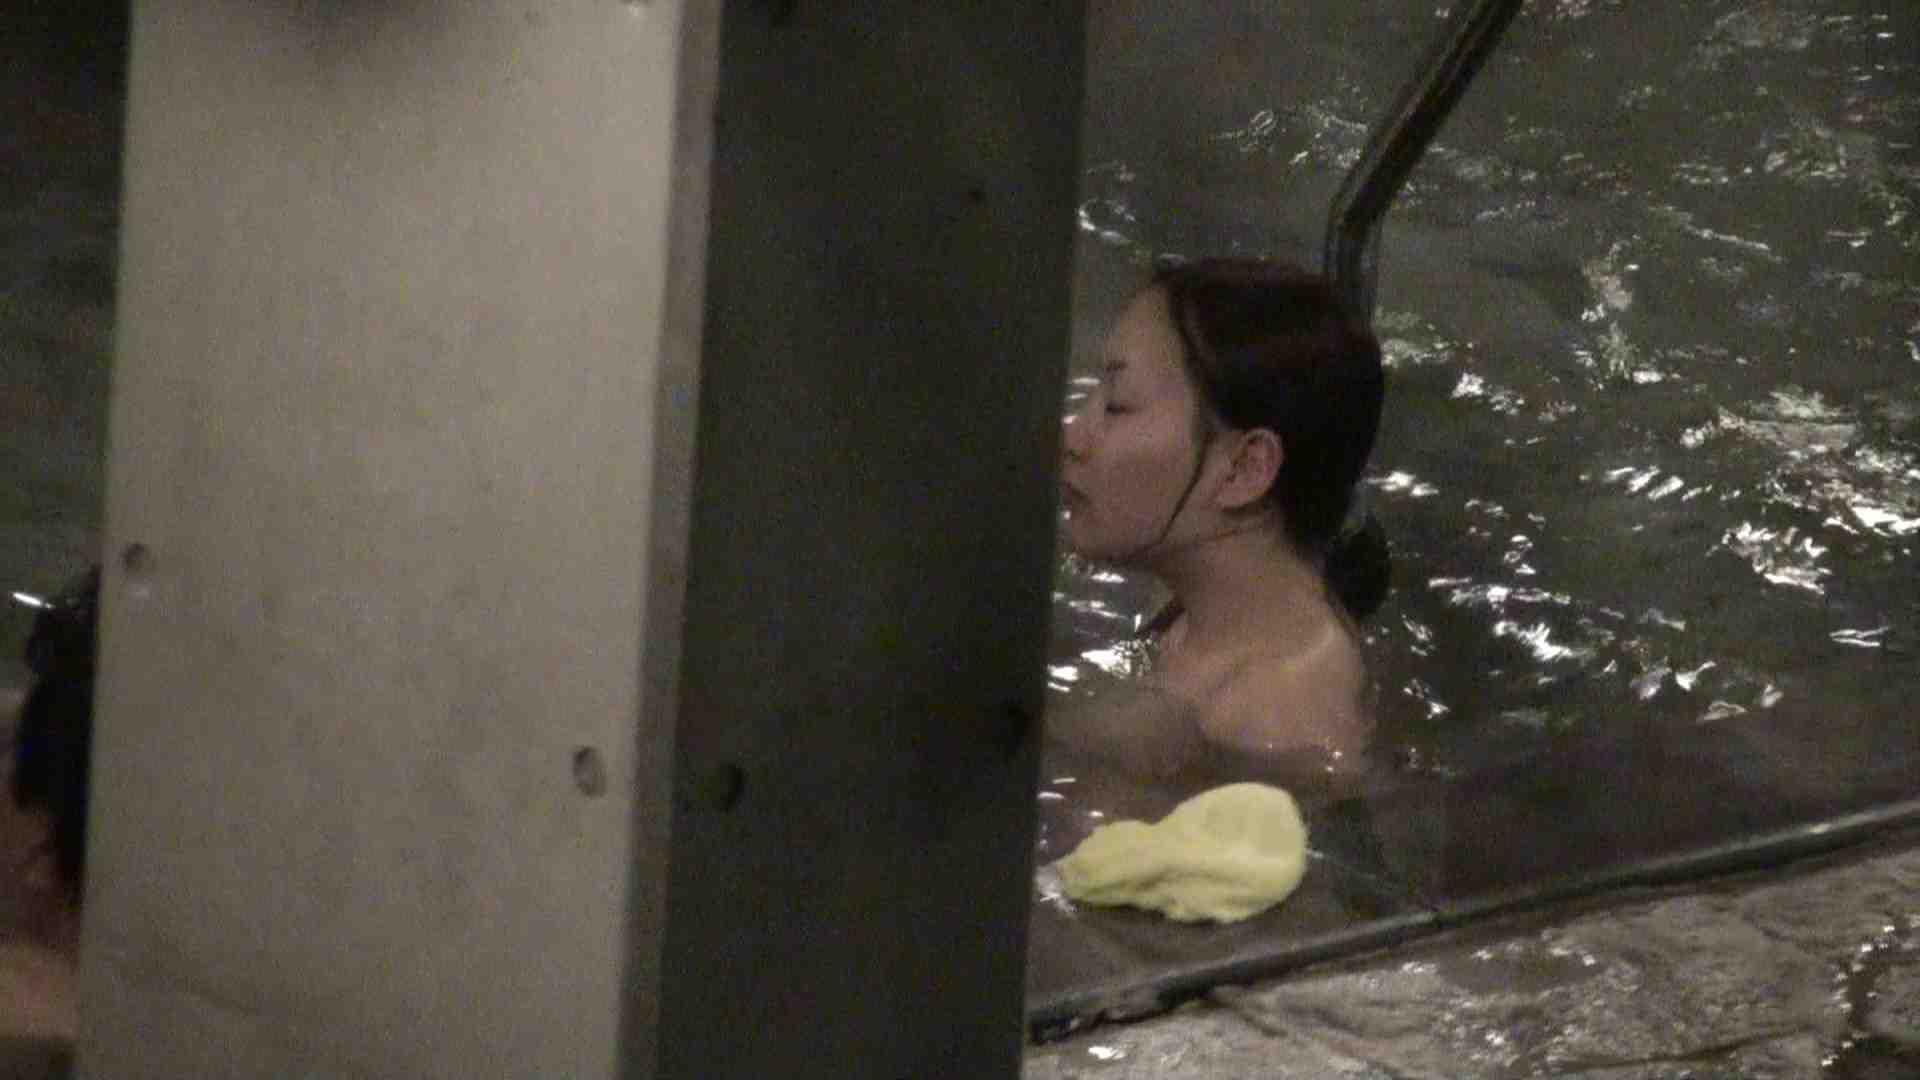 Aquaな露天風呂Vol.438 露天 | OL女体  76連発 34